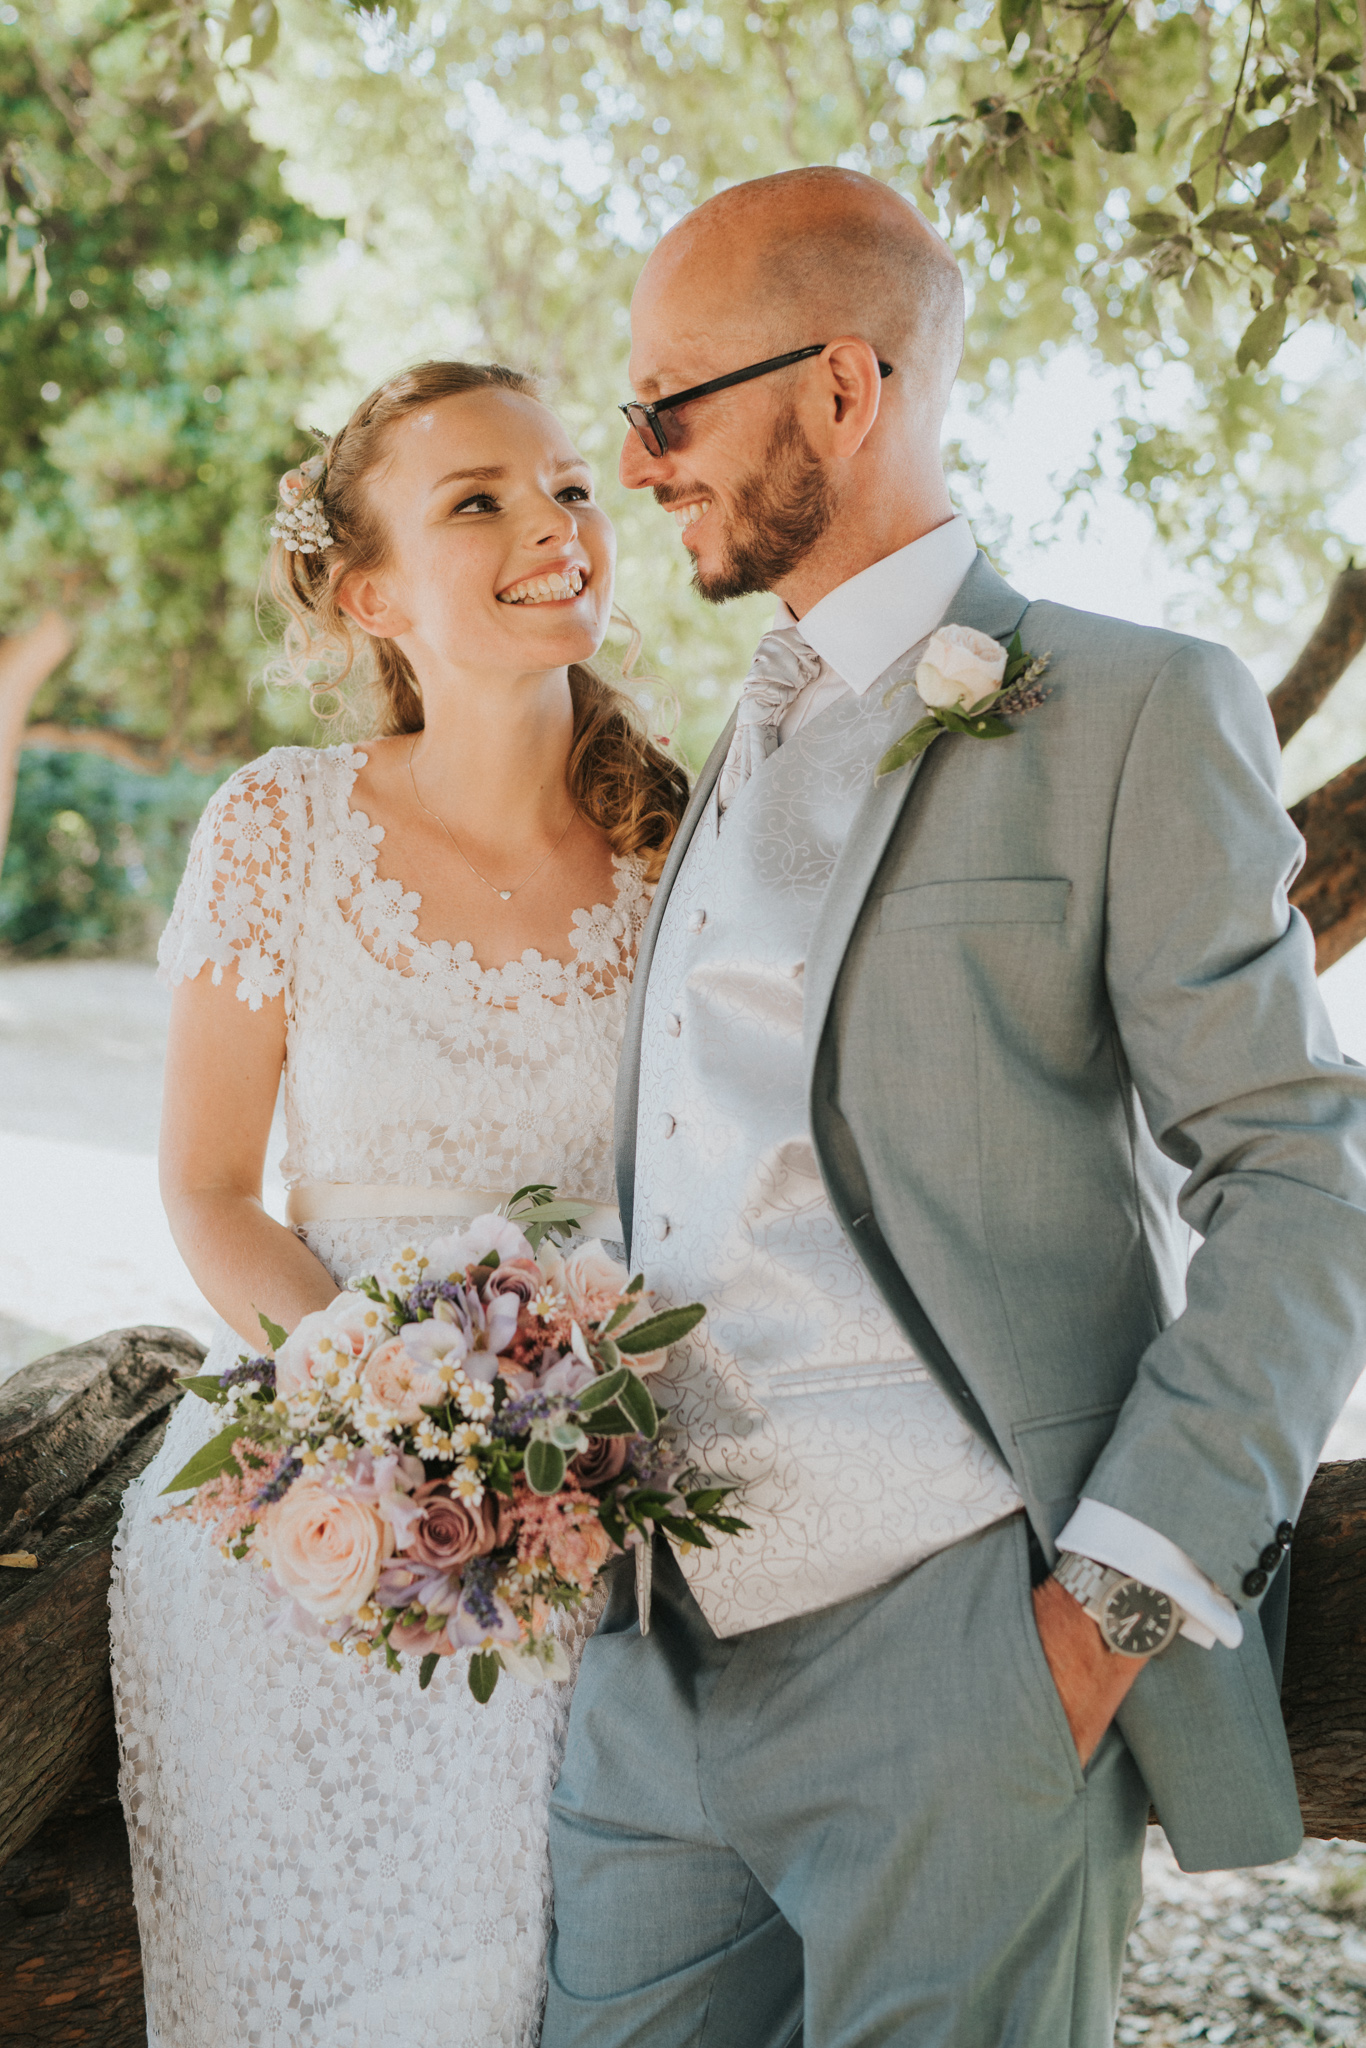 Grace-Elizabeth-Georgie-Amalaketu-Firstsite-Colchester-Essex-Boho-Buddhist-Wedding-Alternative-Wedding-Photography-Essex (89 of 100).jpg